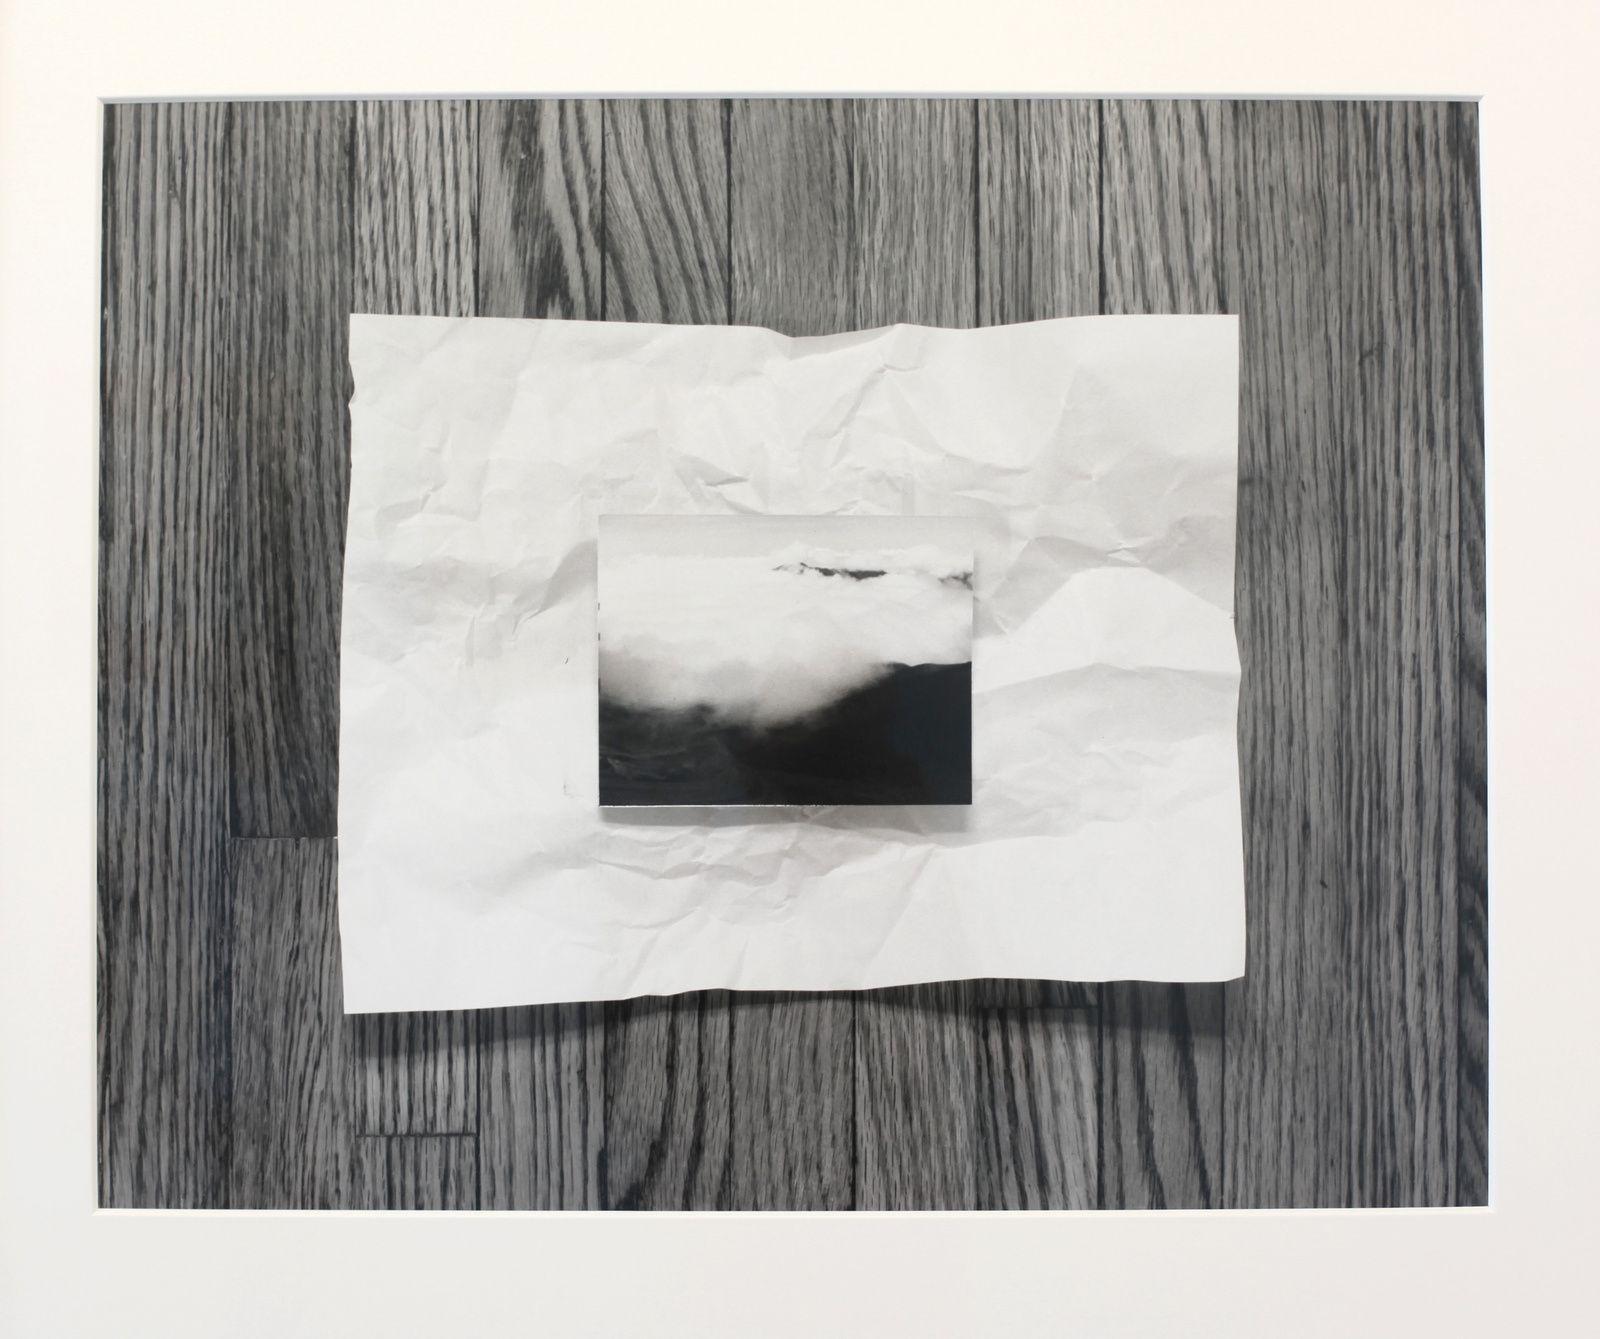 """Riffs on Real time"", 2012 - 2017 de Leslie HEWITT - Courtesy Galerie Perrotin © Photo Éric Simon"